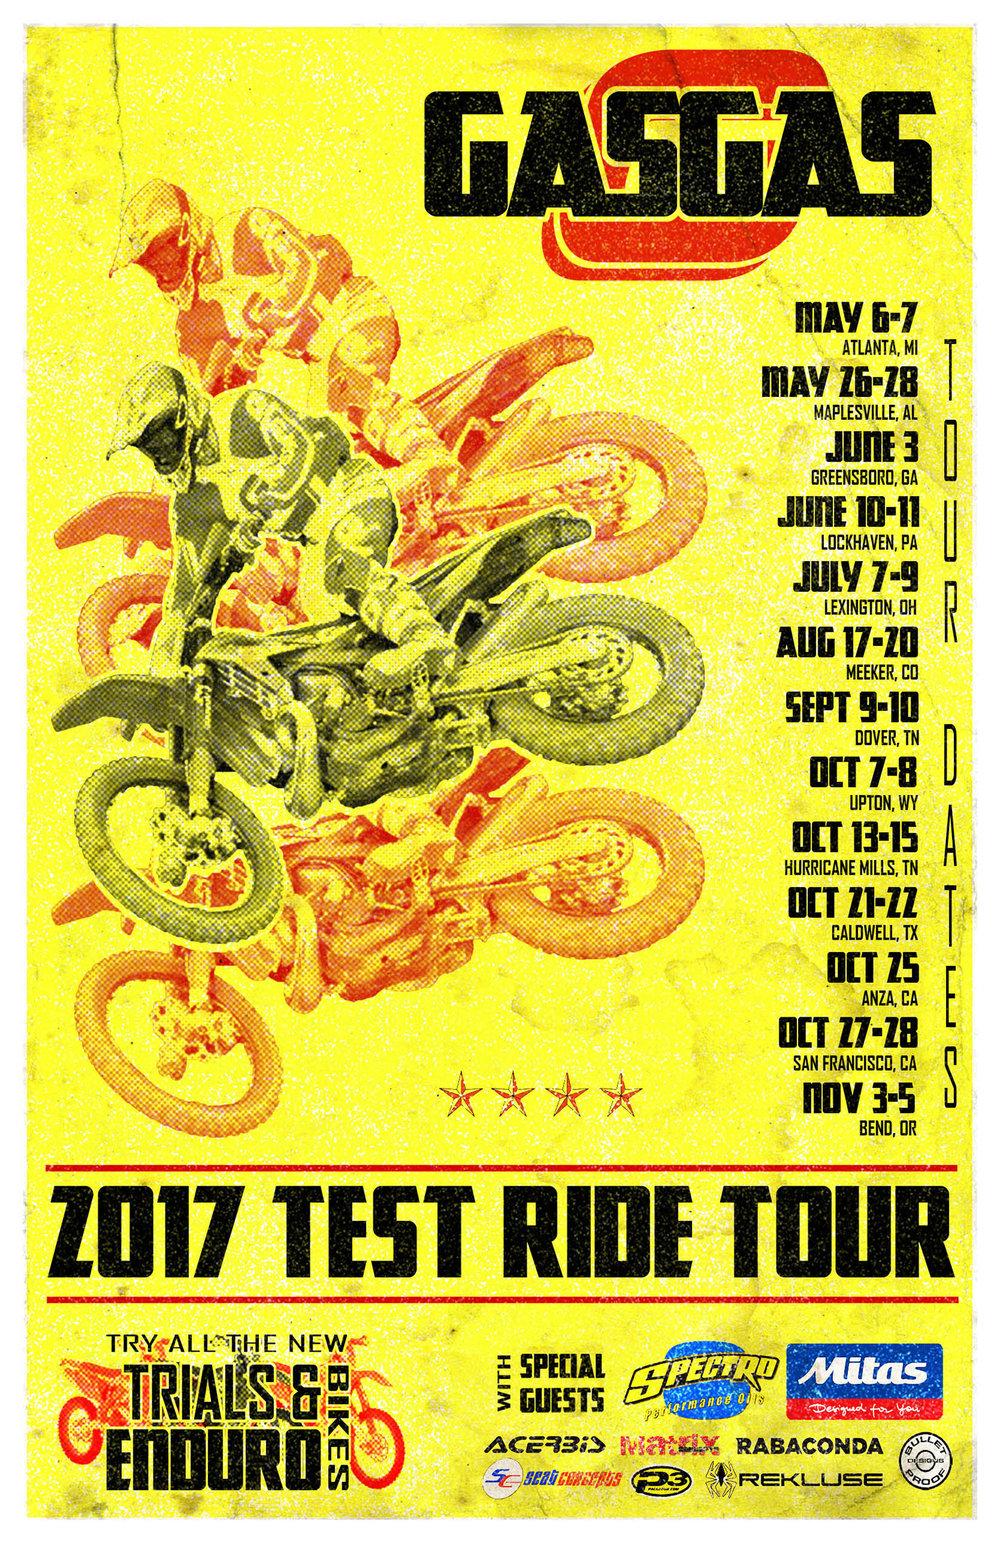 Tour Dates Rock Poster 11x17 DIGITAL Poster V3.jpg